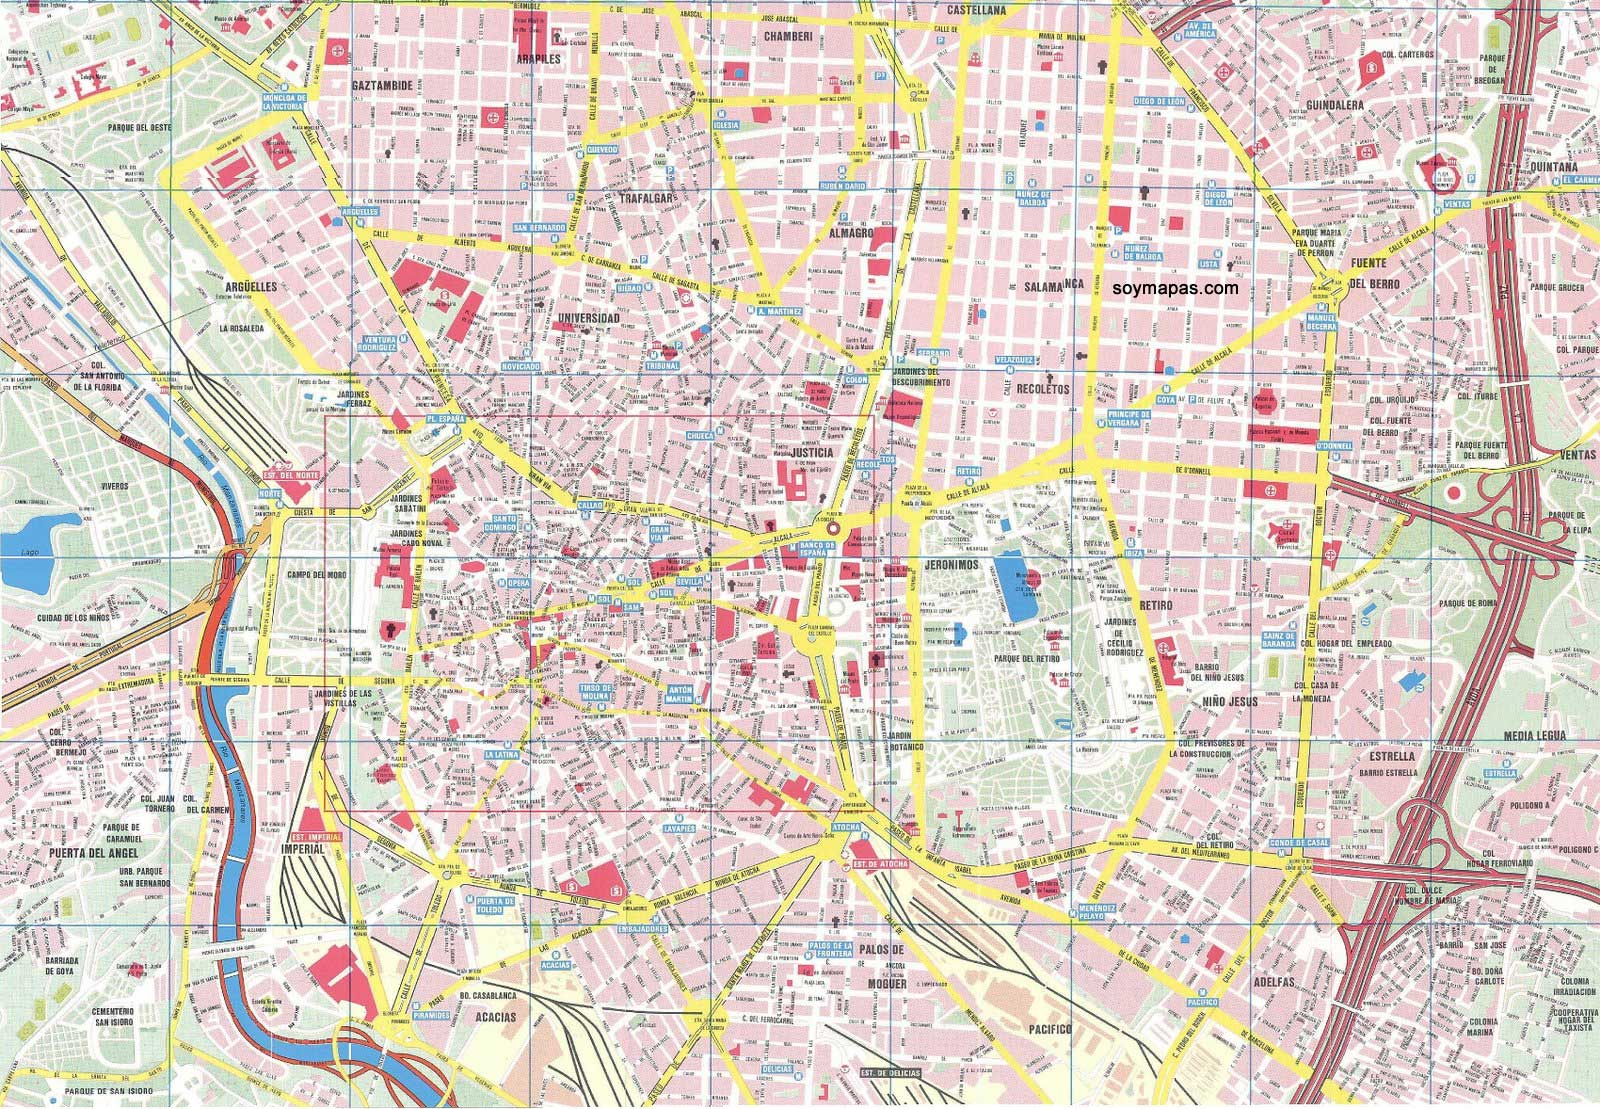 mapa madrid Mapa de Madrid | Barrios de Madrid mapa madrid